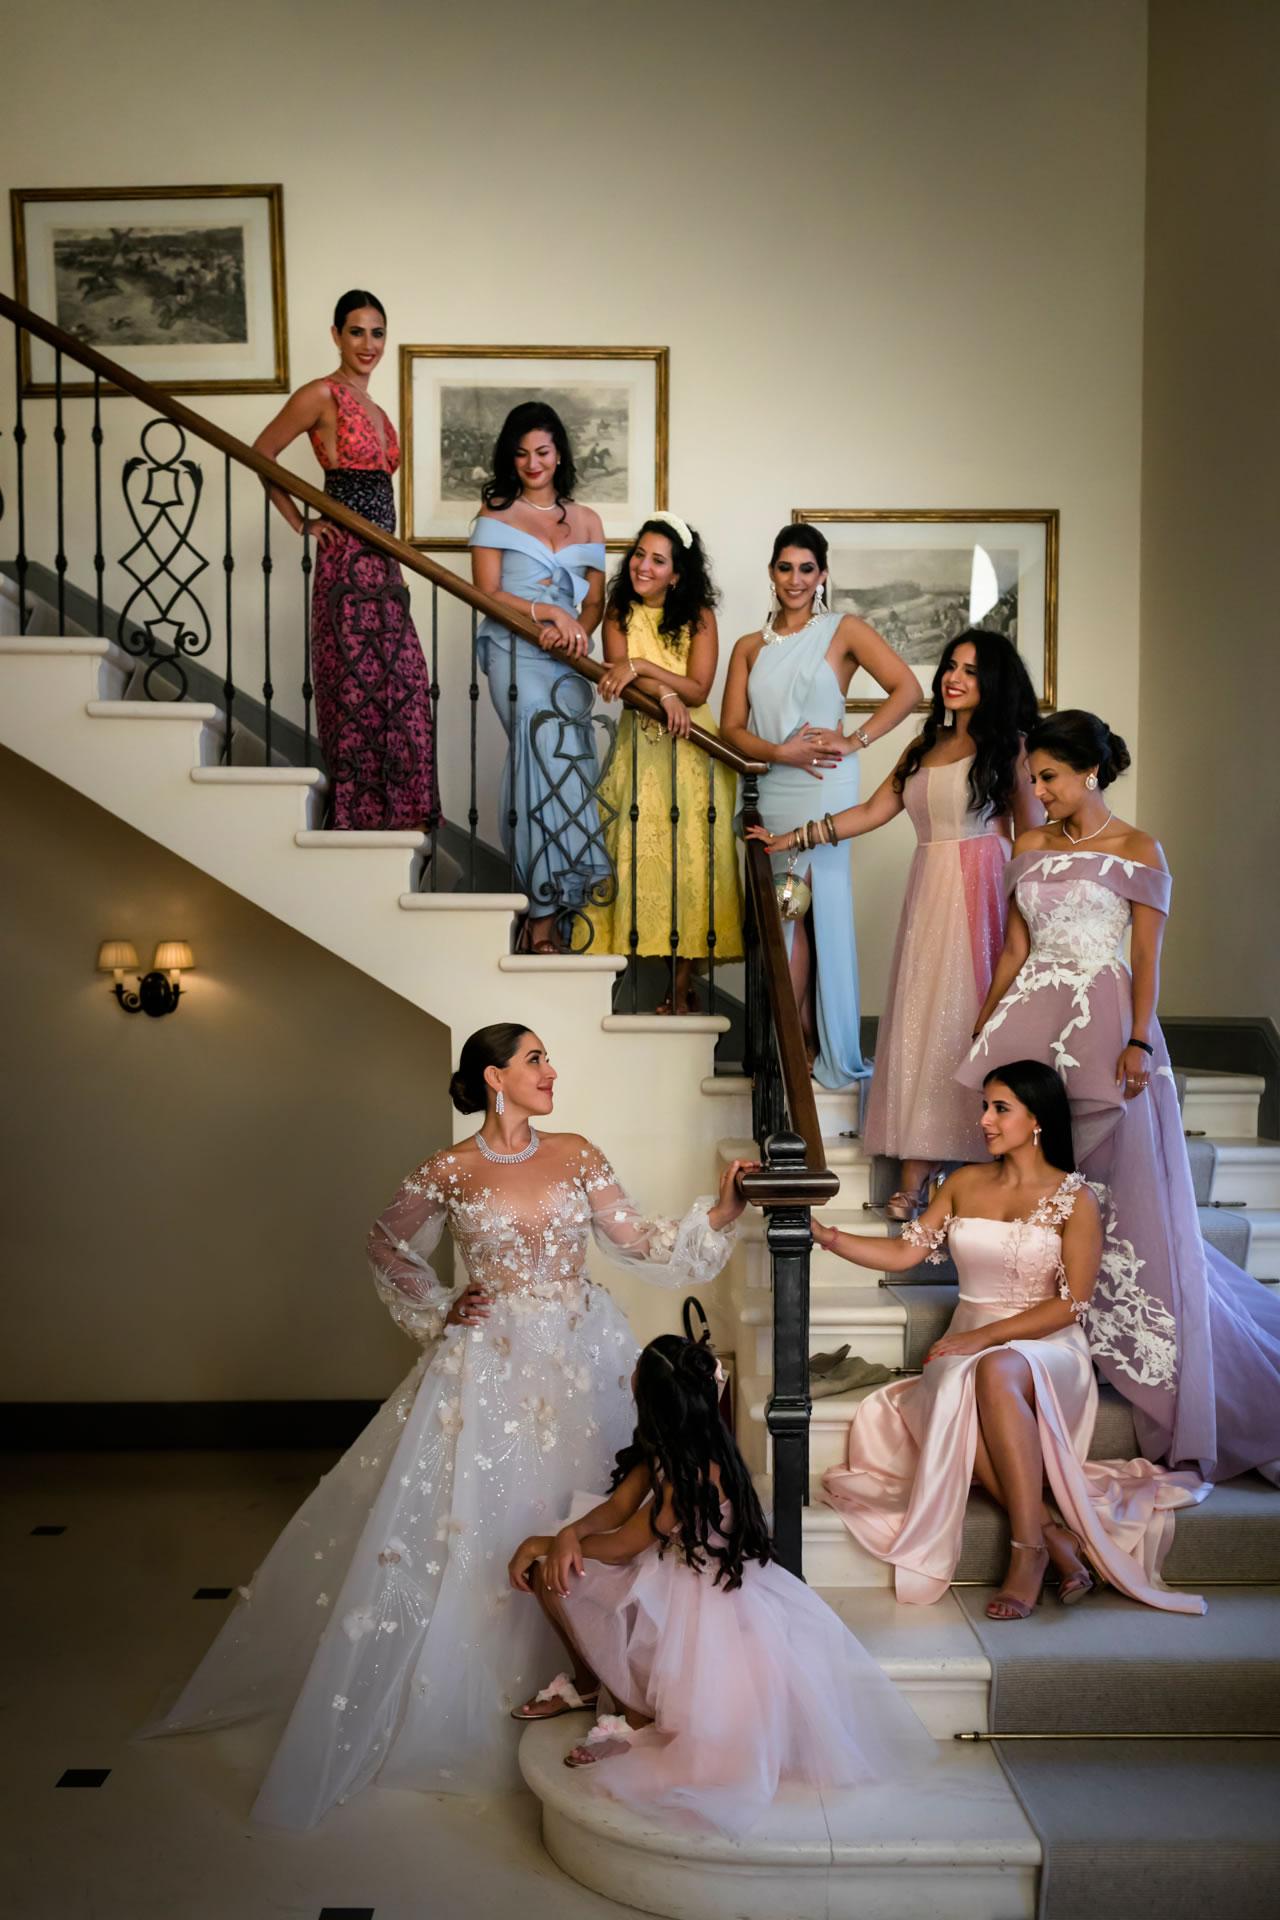 Stairs :: Luxury wedding at Il Borro :: Luxury wedding photography - 14 :: Stairs